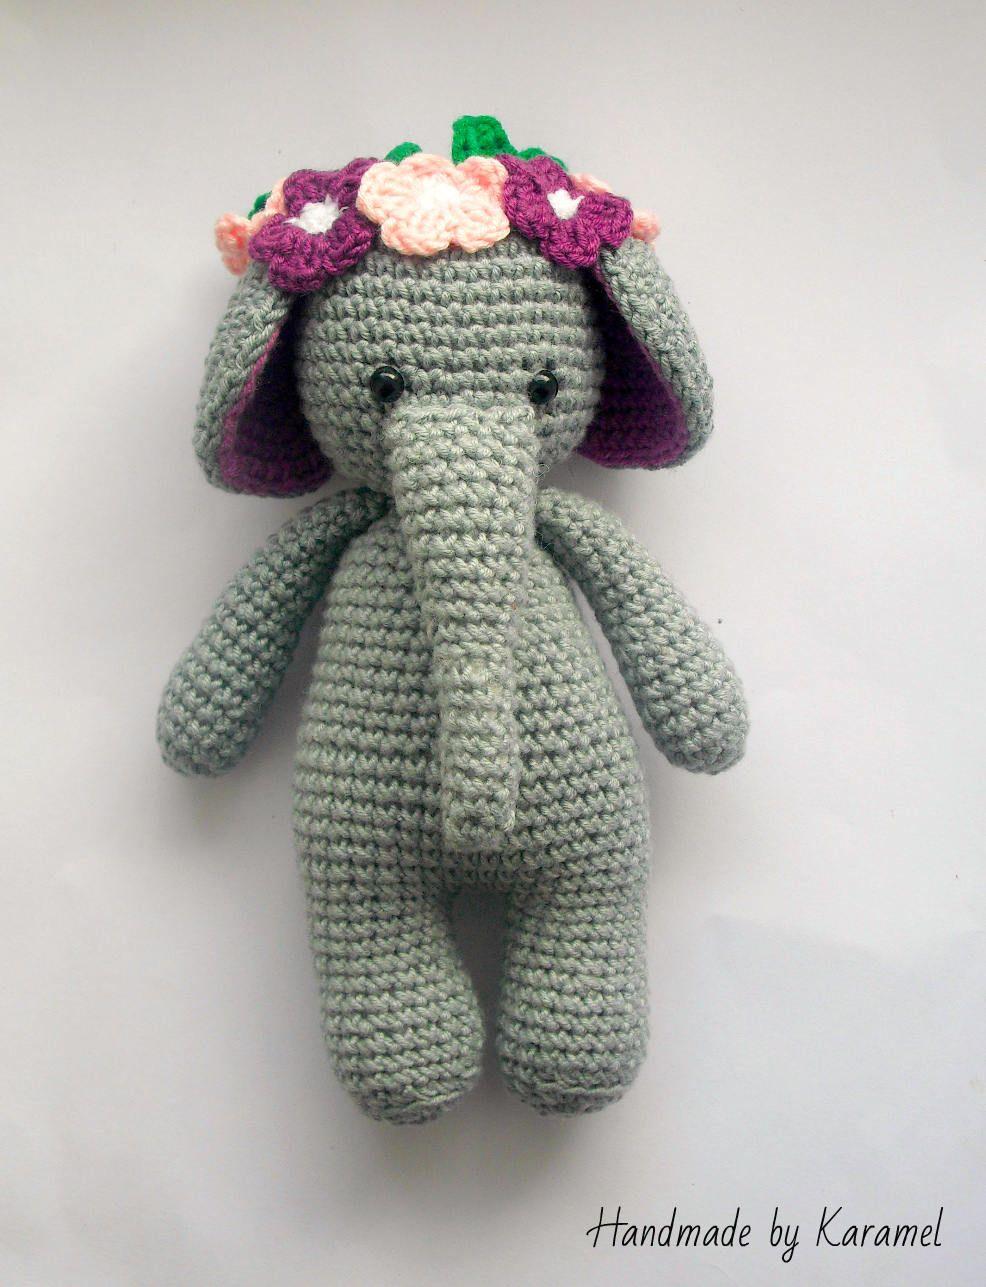 Items similar to Elephant Amigurumi / Crochet Elephant / Handmade ... | 1287x986